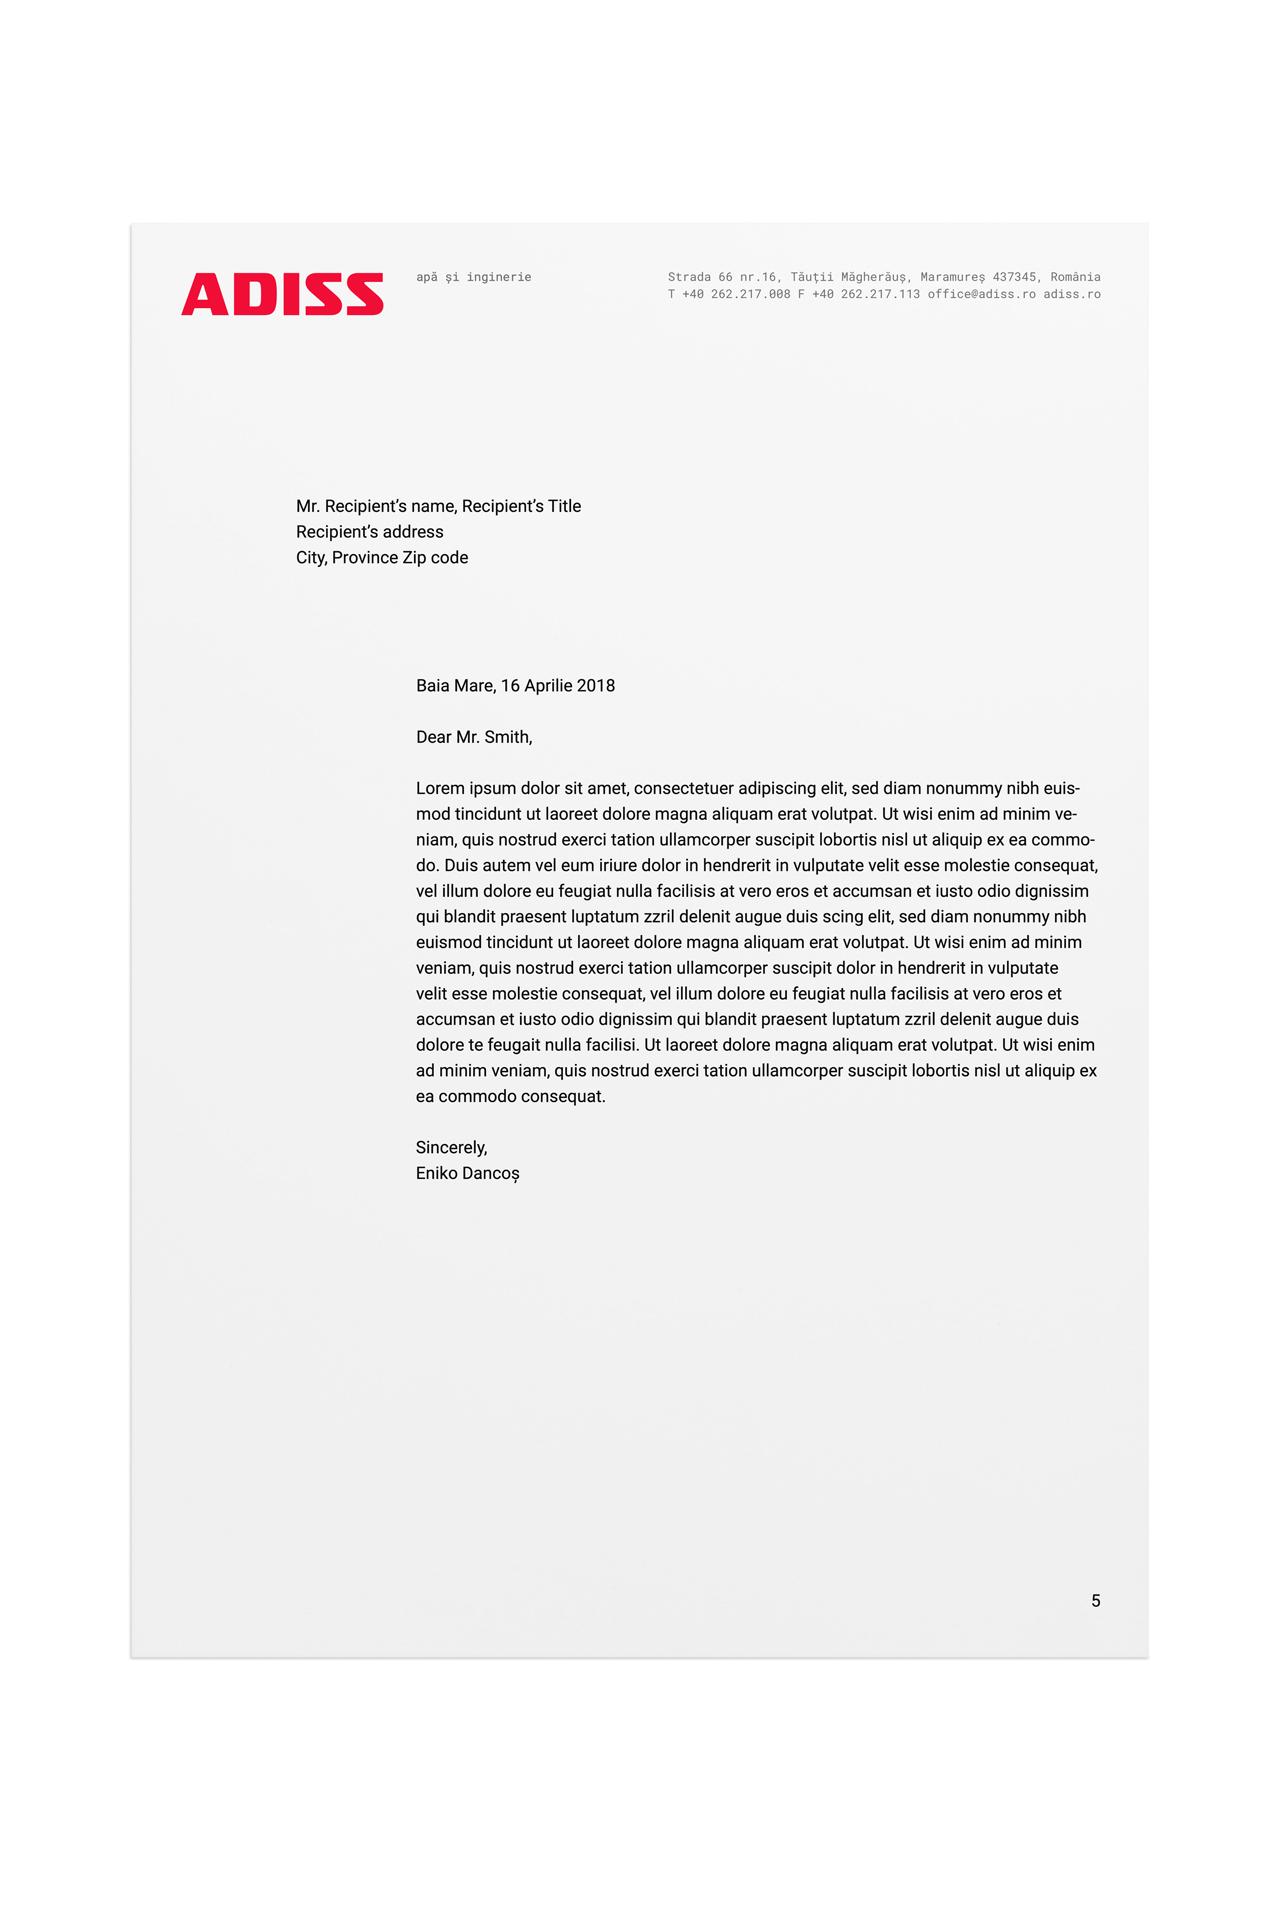 Adiss-letterhead-03.jpg